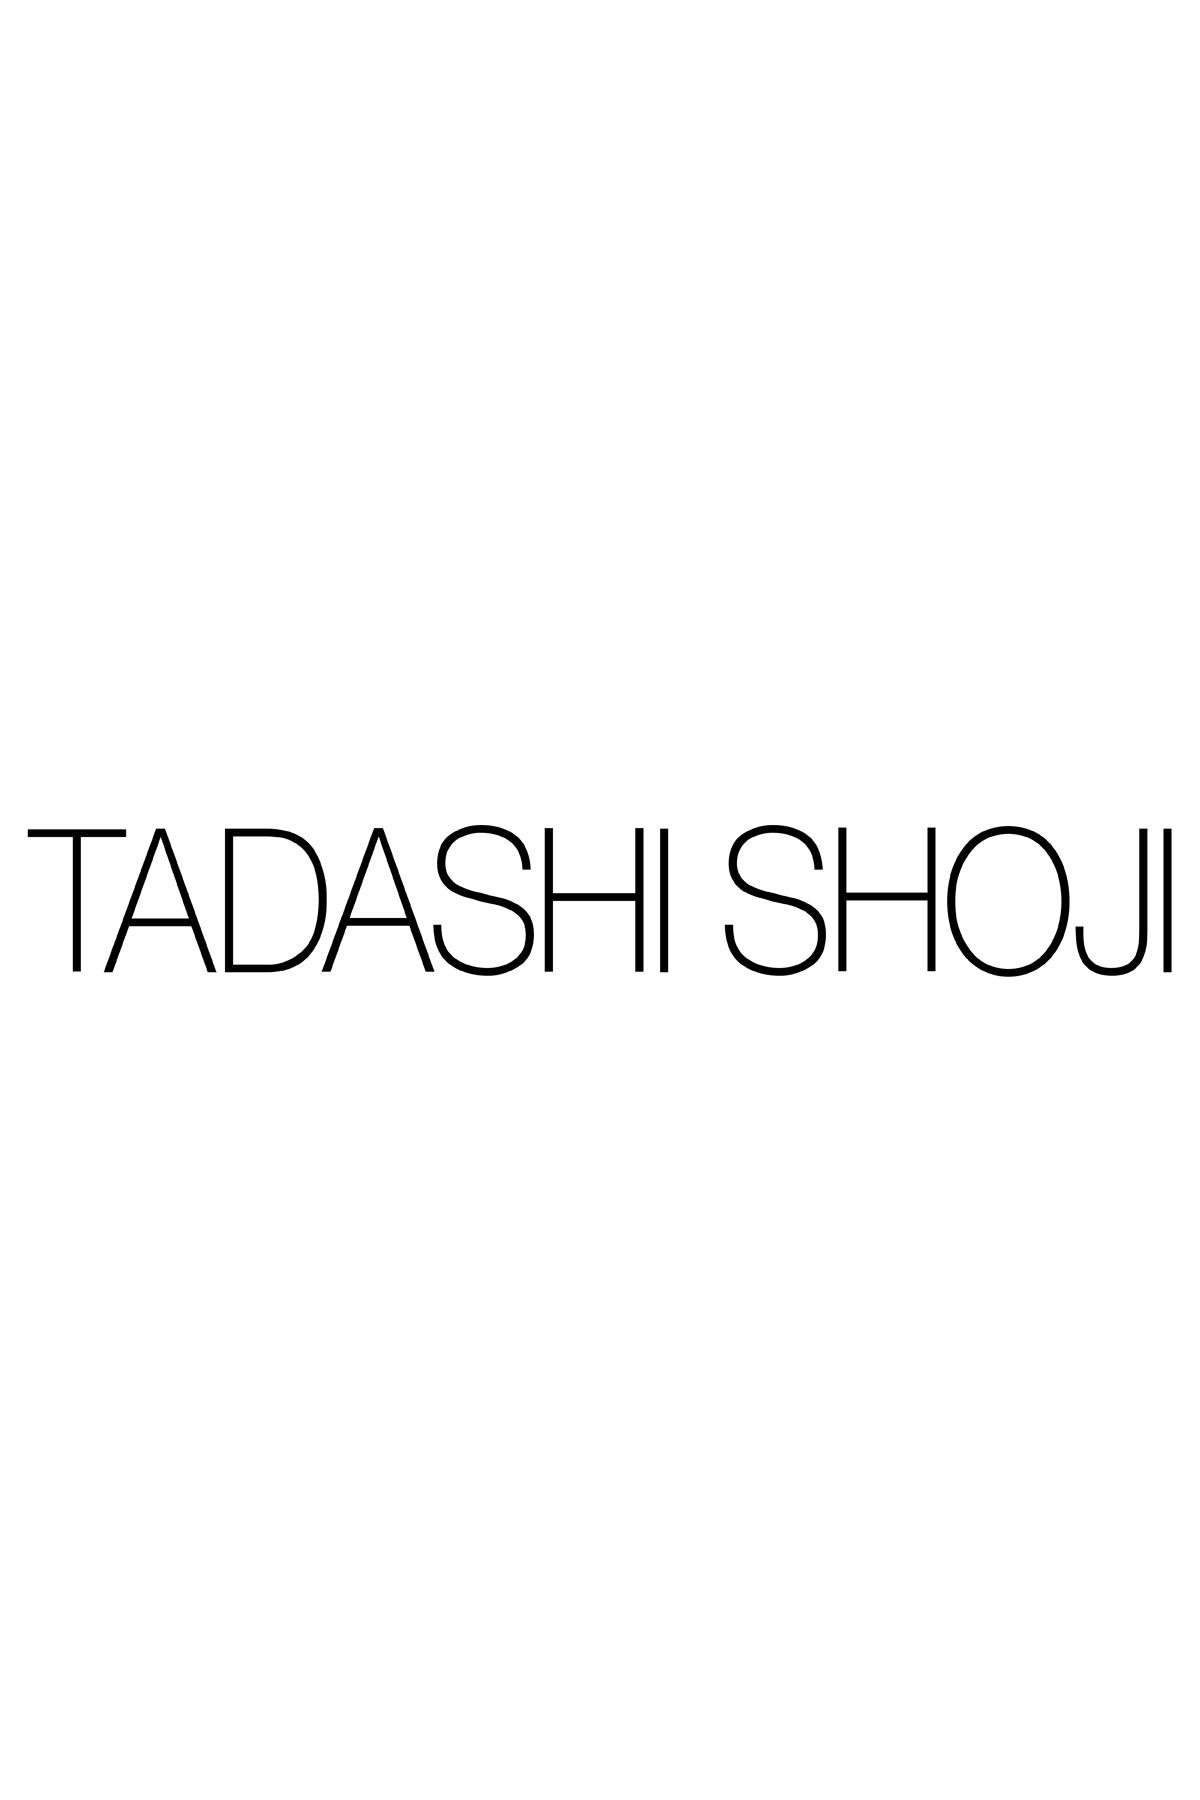 Tadashi Shoji - Evka Lace Embroidered Dress